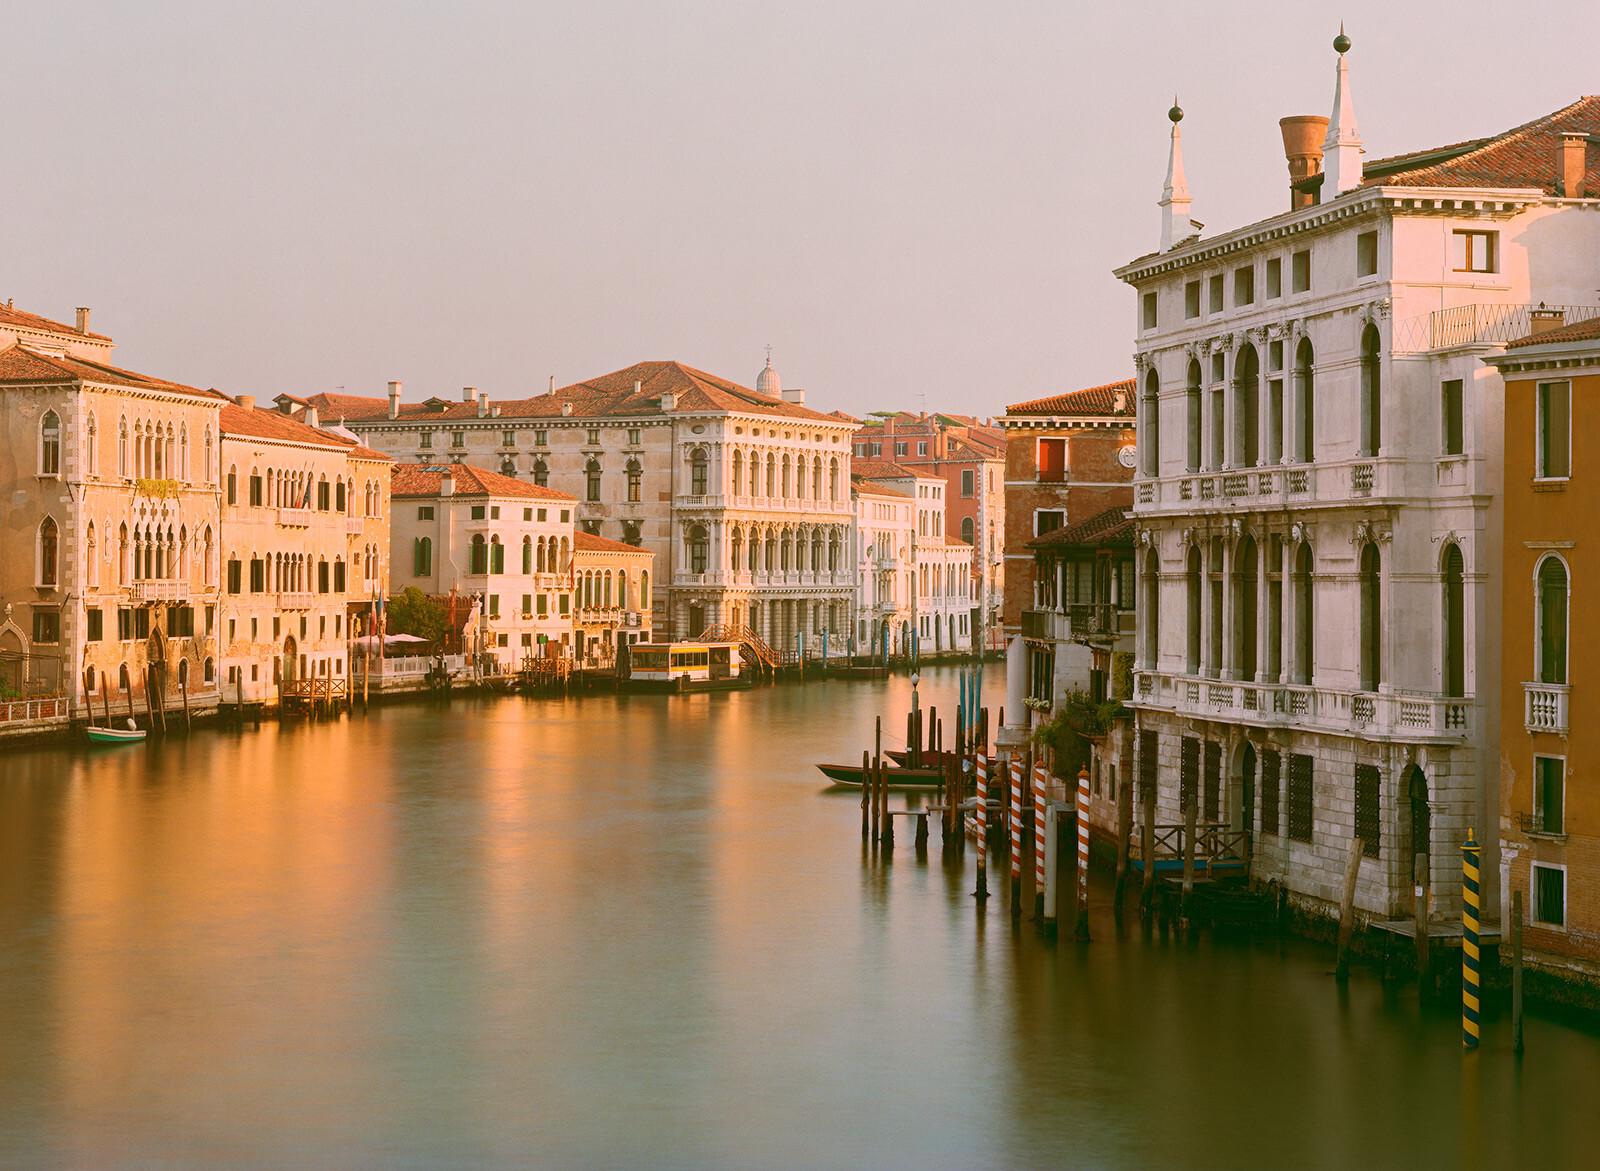 Venezia IX - Ralph Hinterkeuser